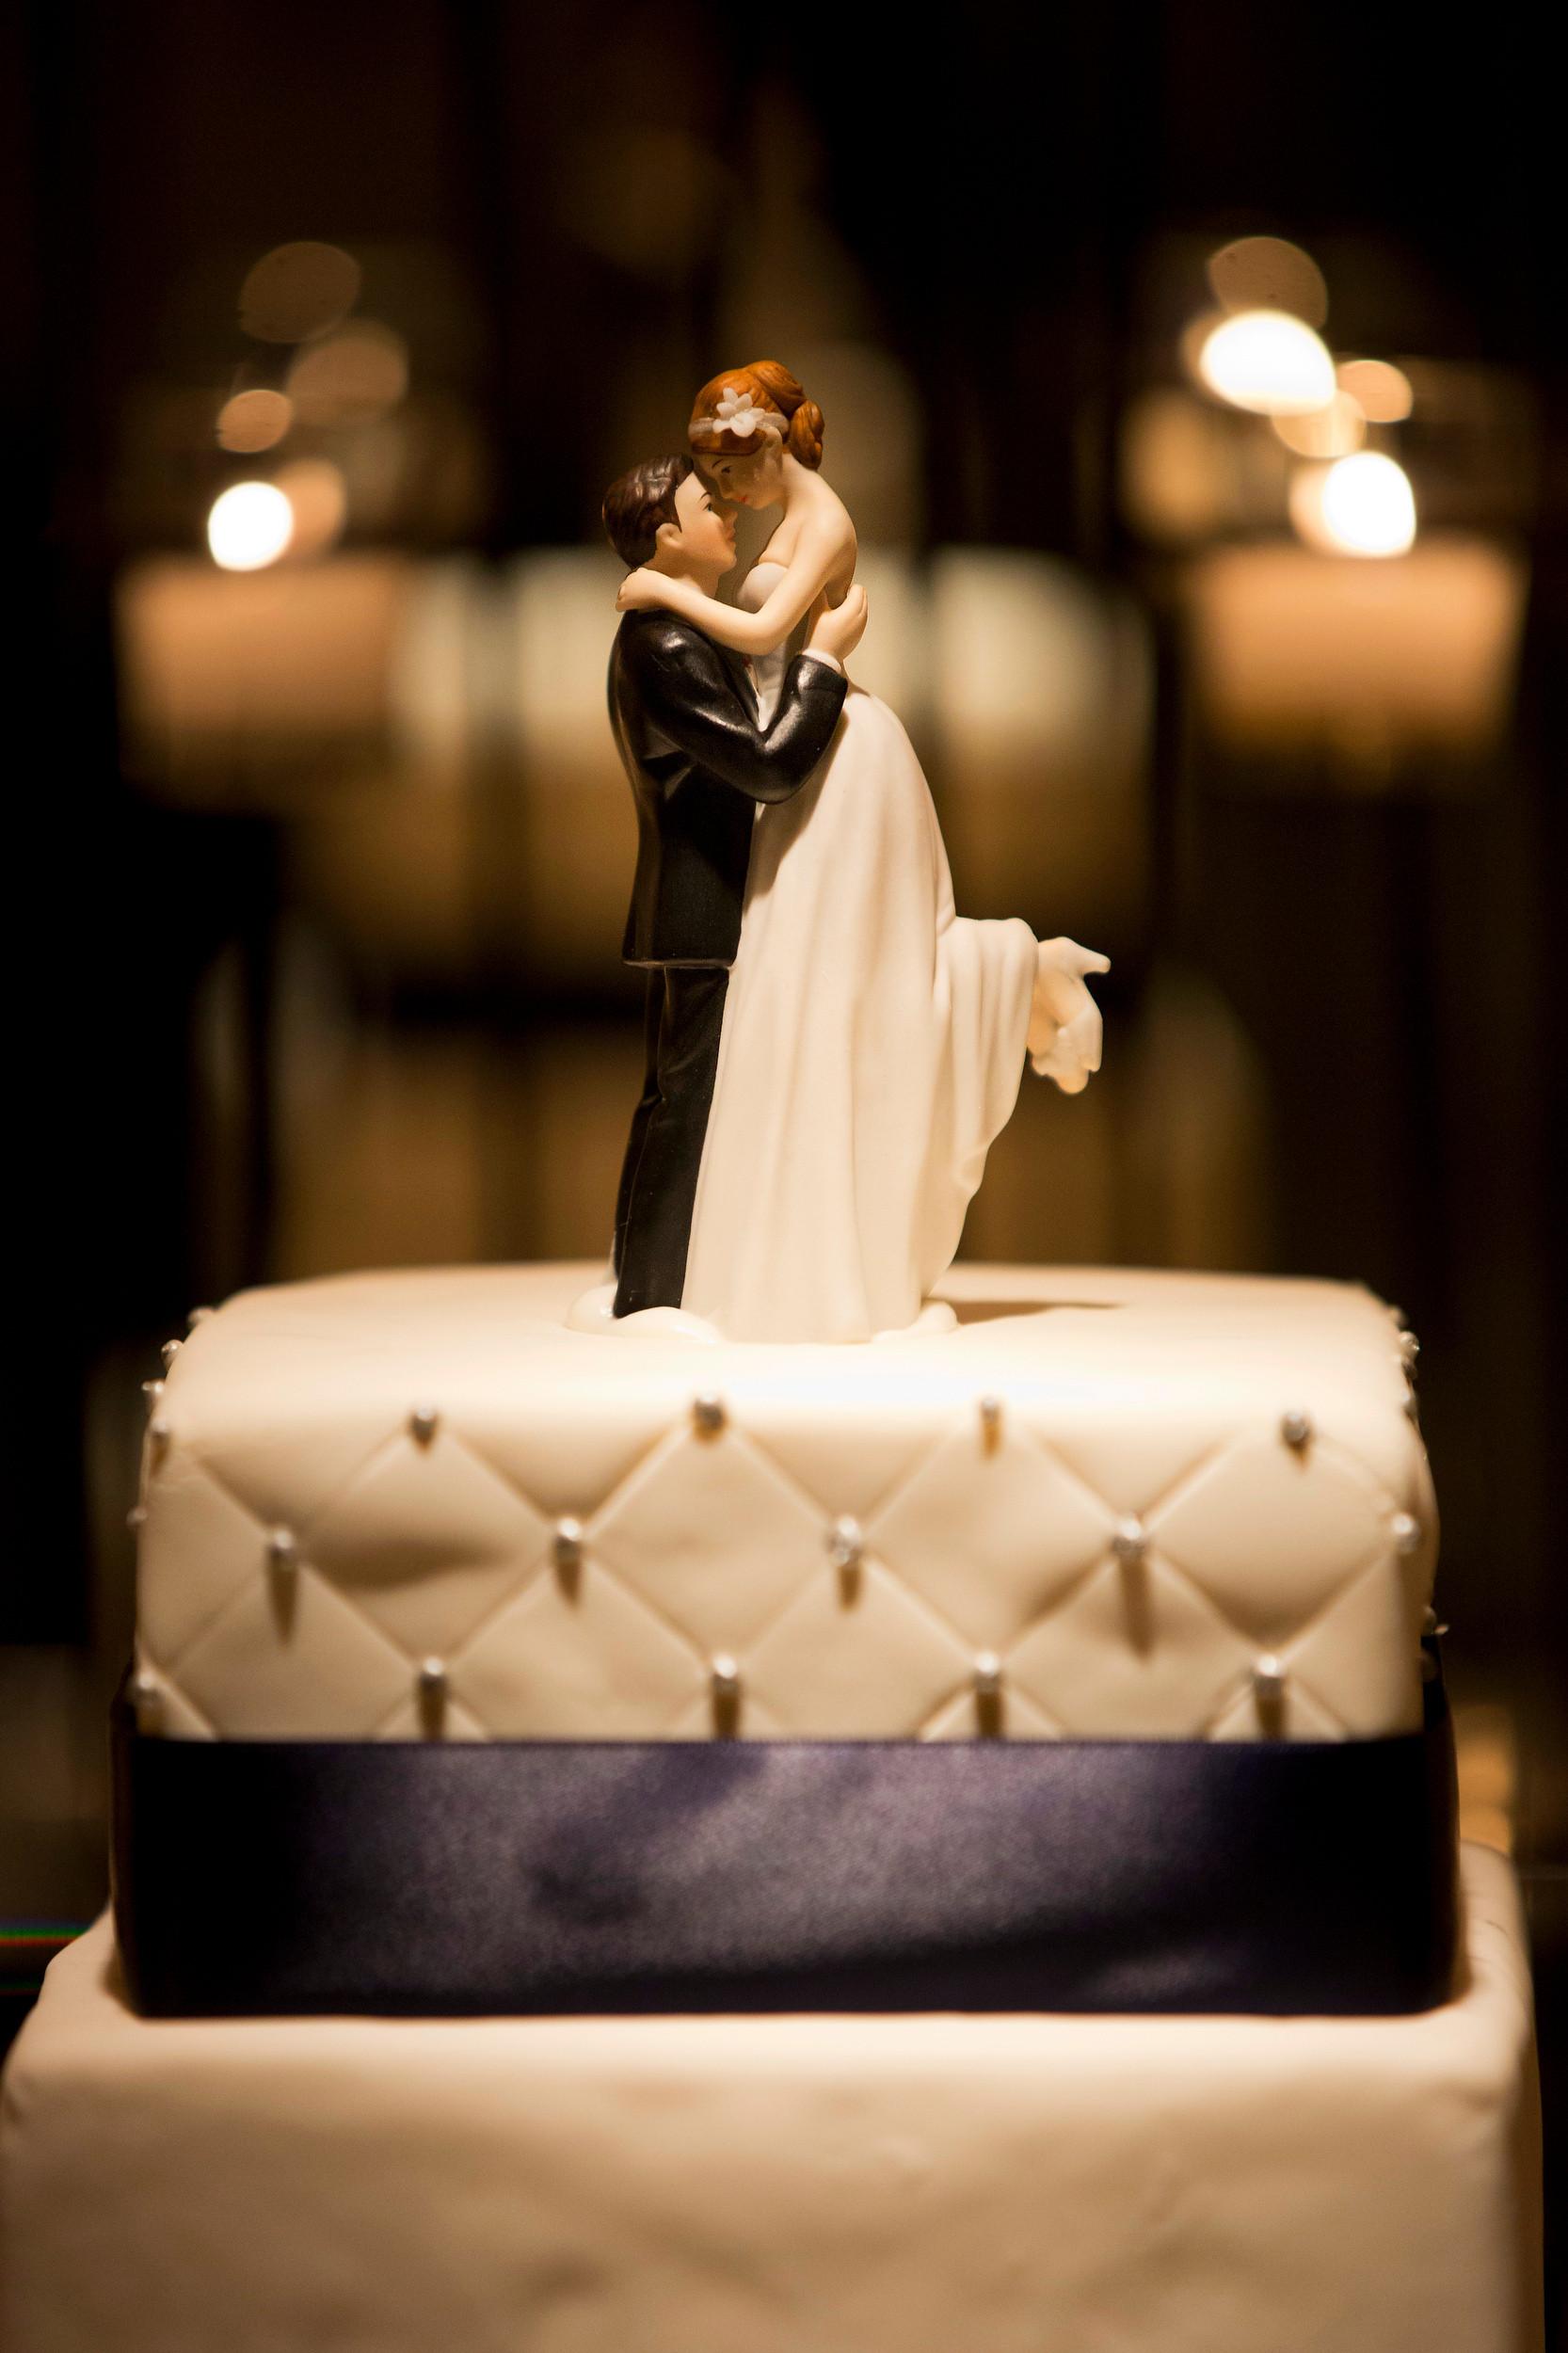 Funny Cake Toppers For Wedding Cakes  Garrett Hubbard Studios